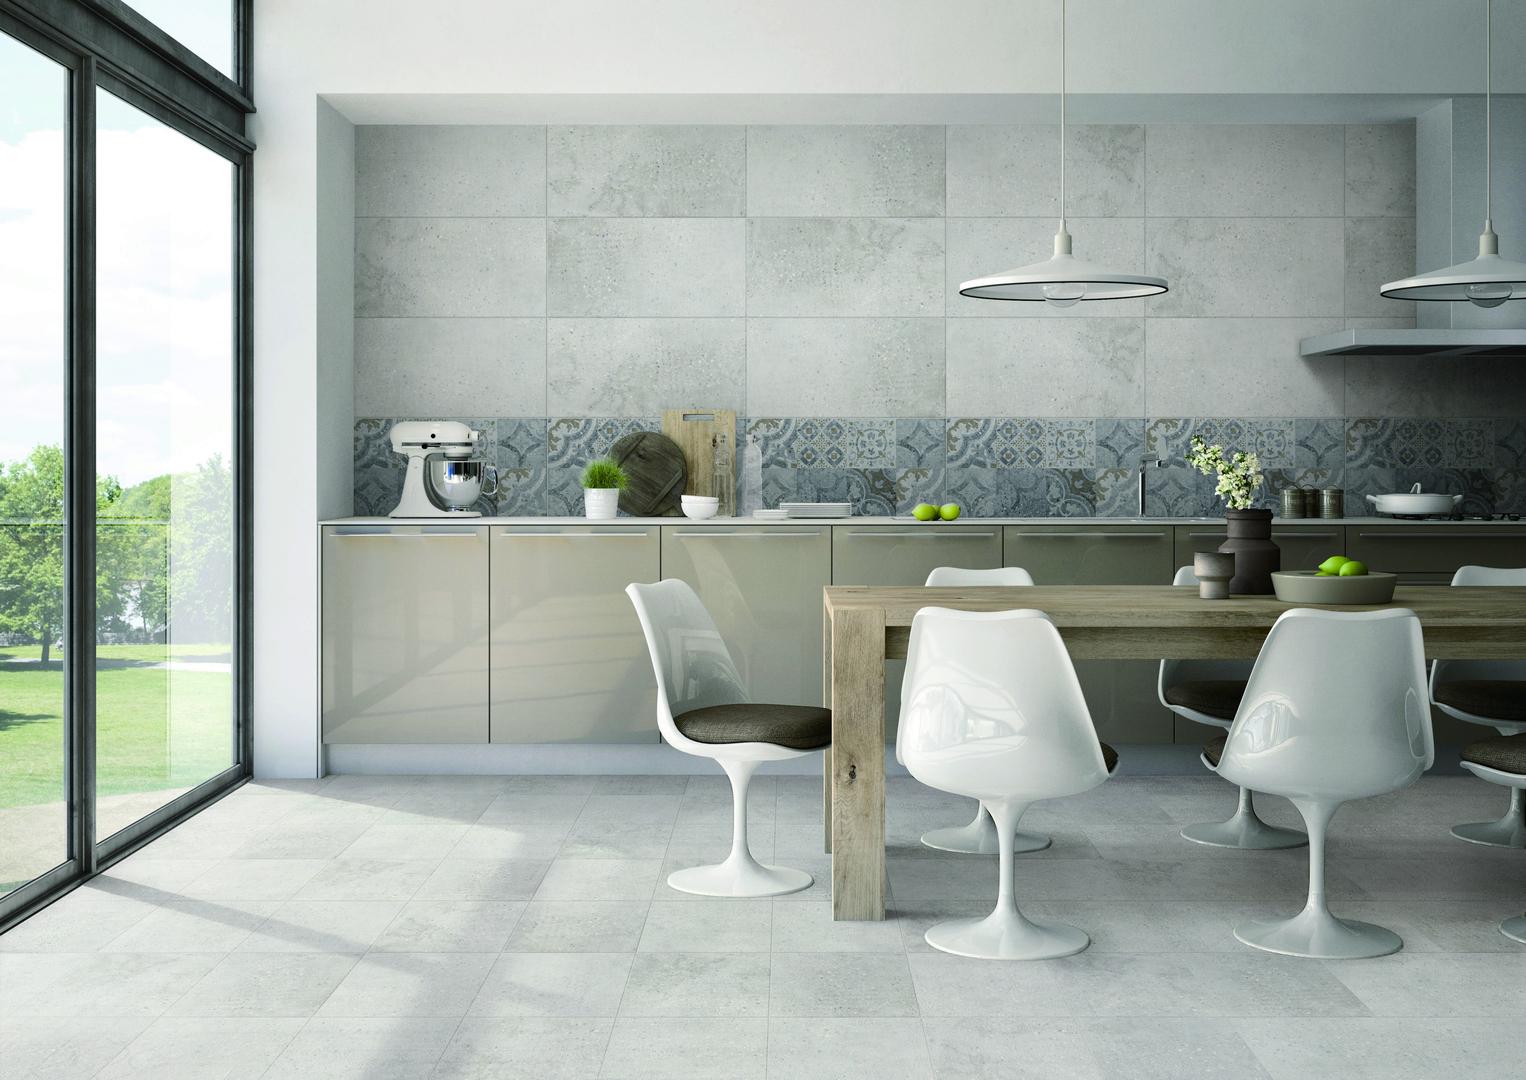 Bathroom Fixtures Utah flooring, bath fixtures - image home decor - provo, utah